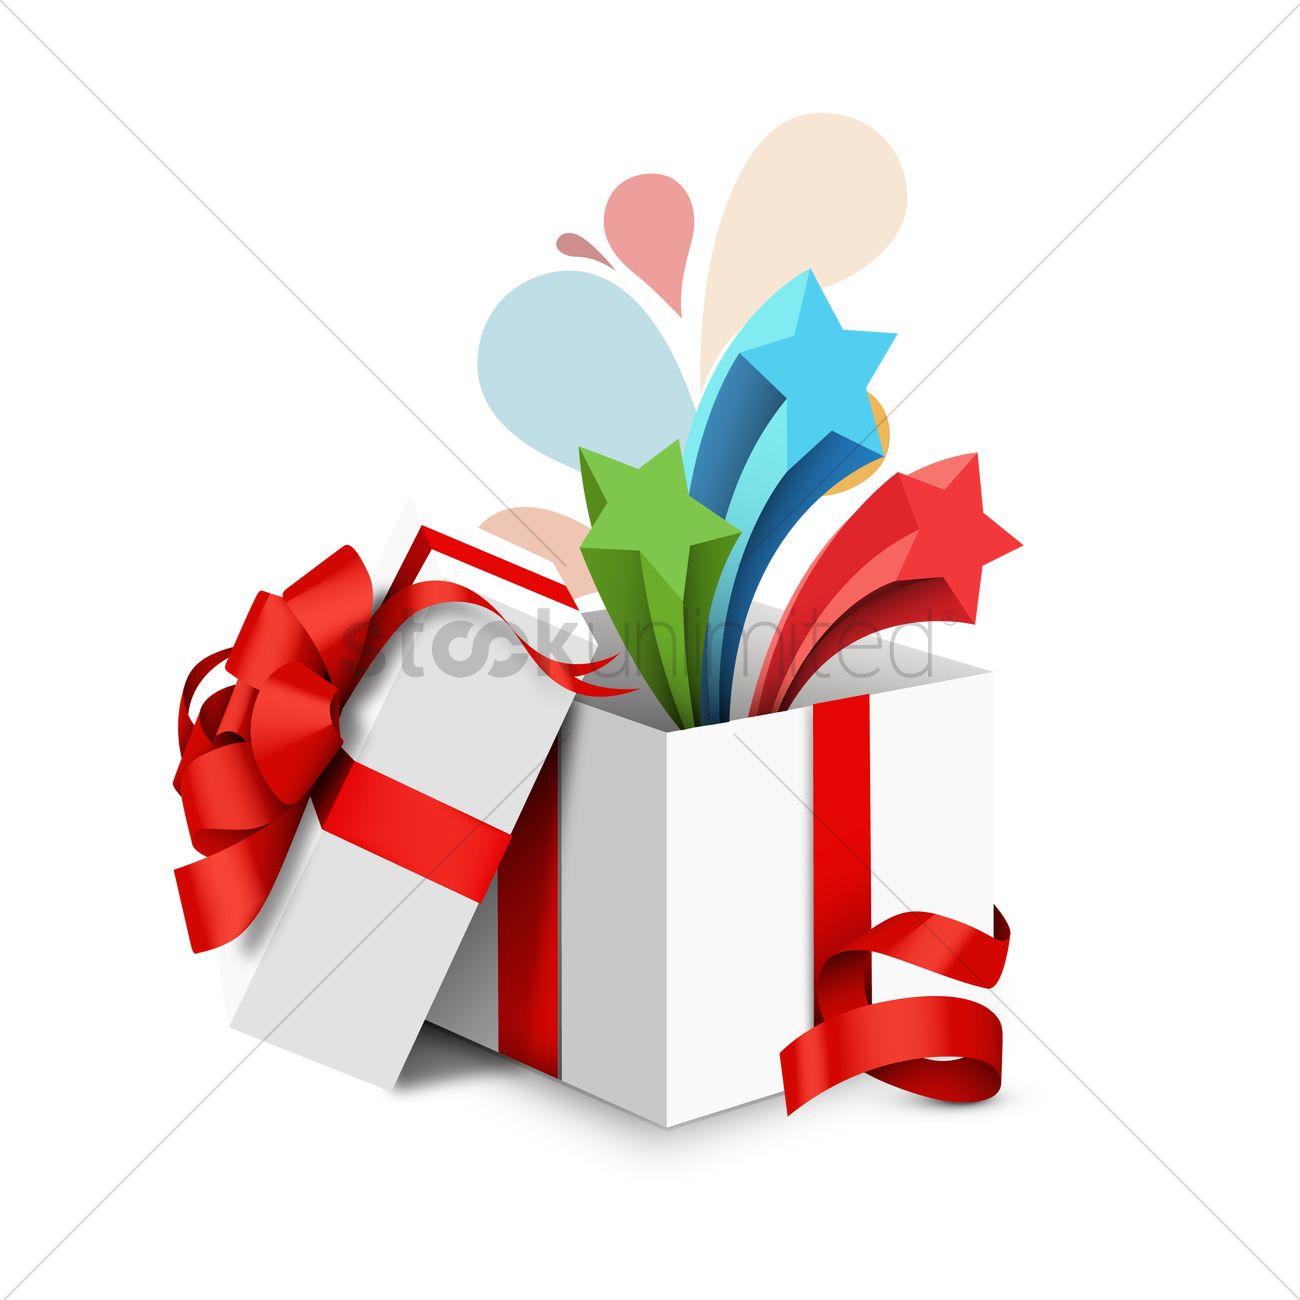 opened gift box ベクタークリップアート 1501453 stockunlimited